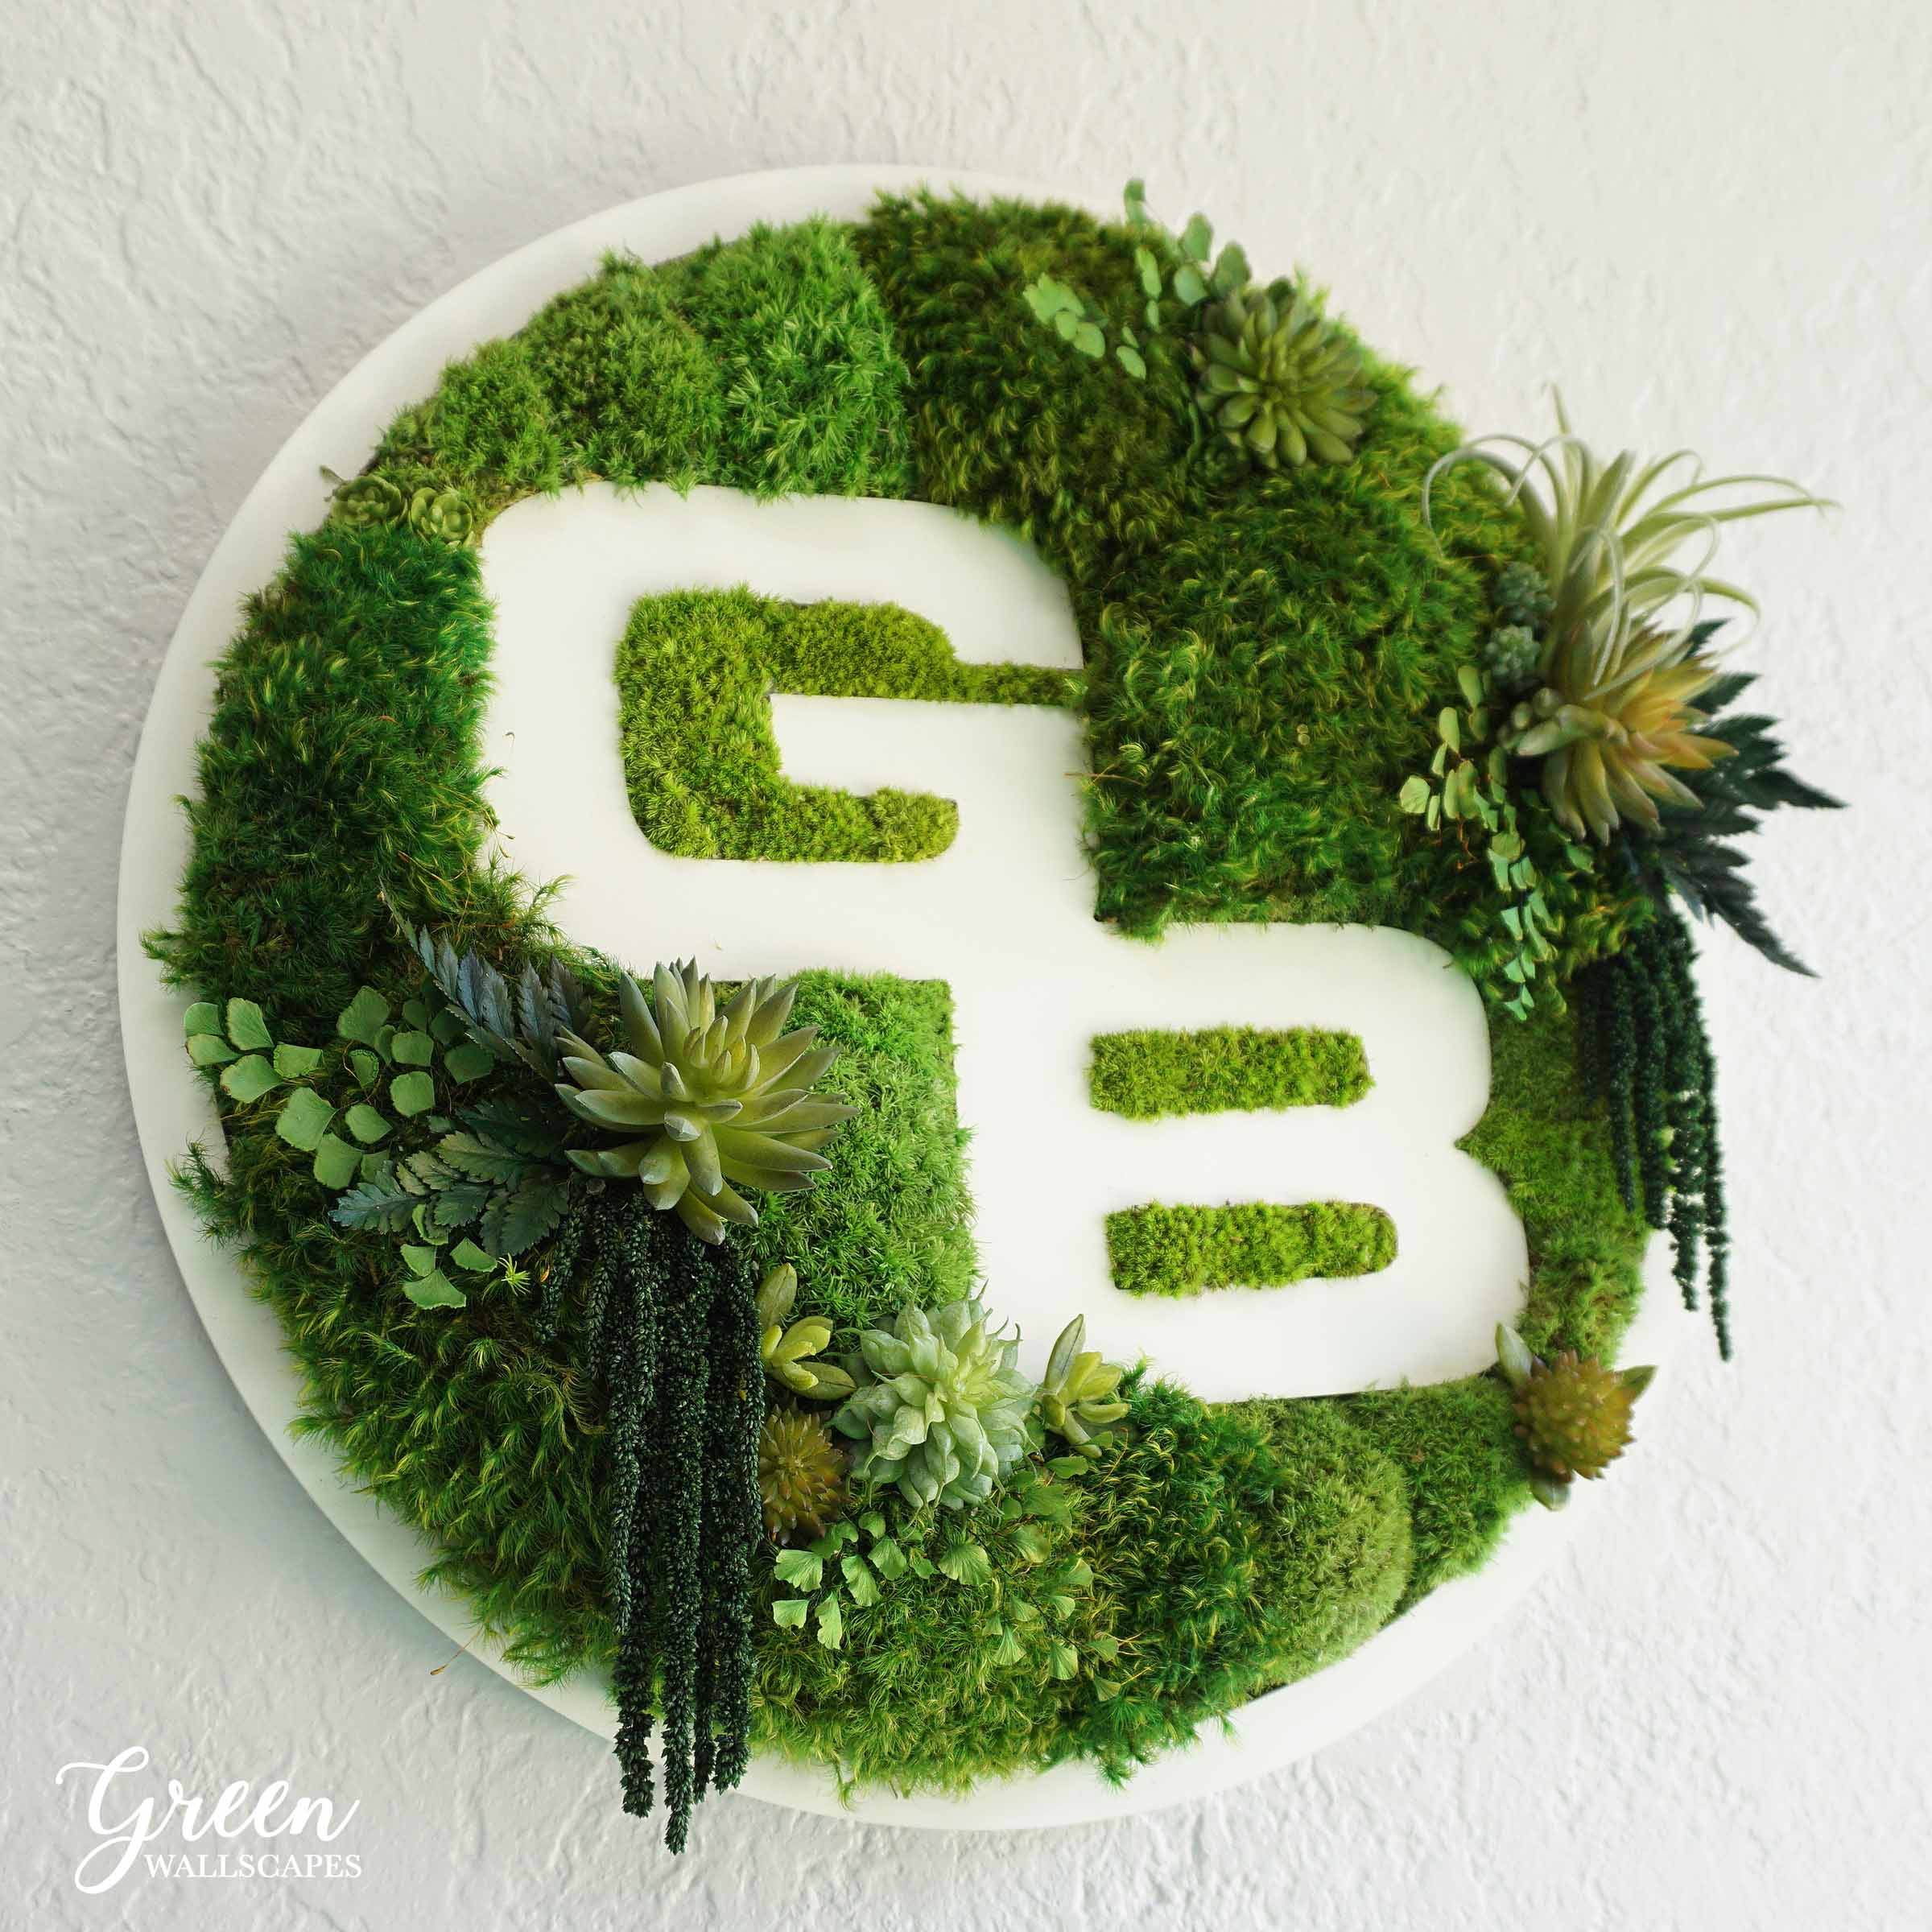 gb_circle_-_moss_and_succulent_logo.jpg